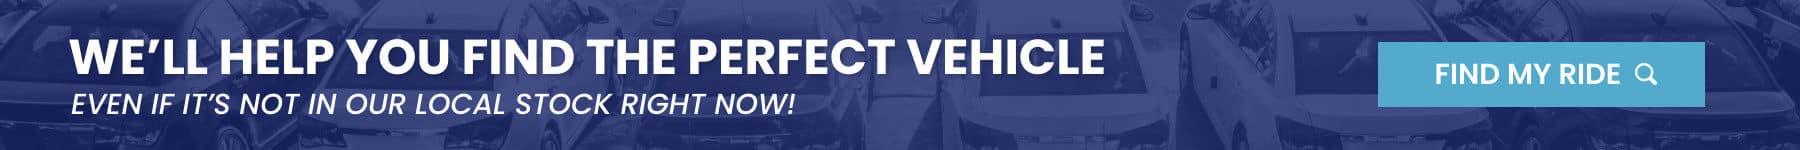 vehicle finder service banner